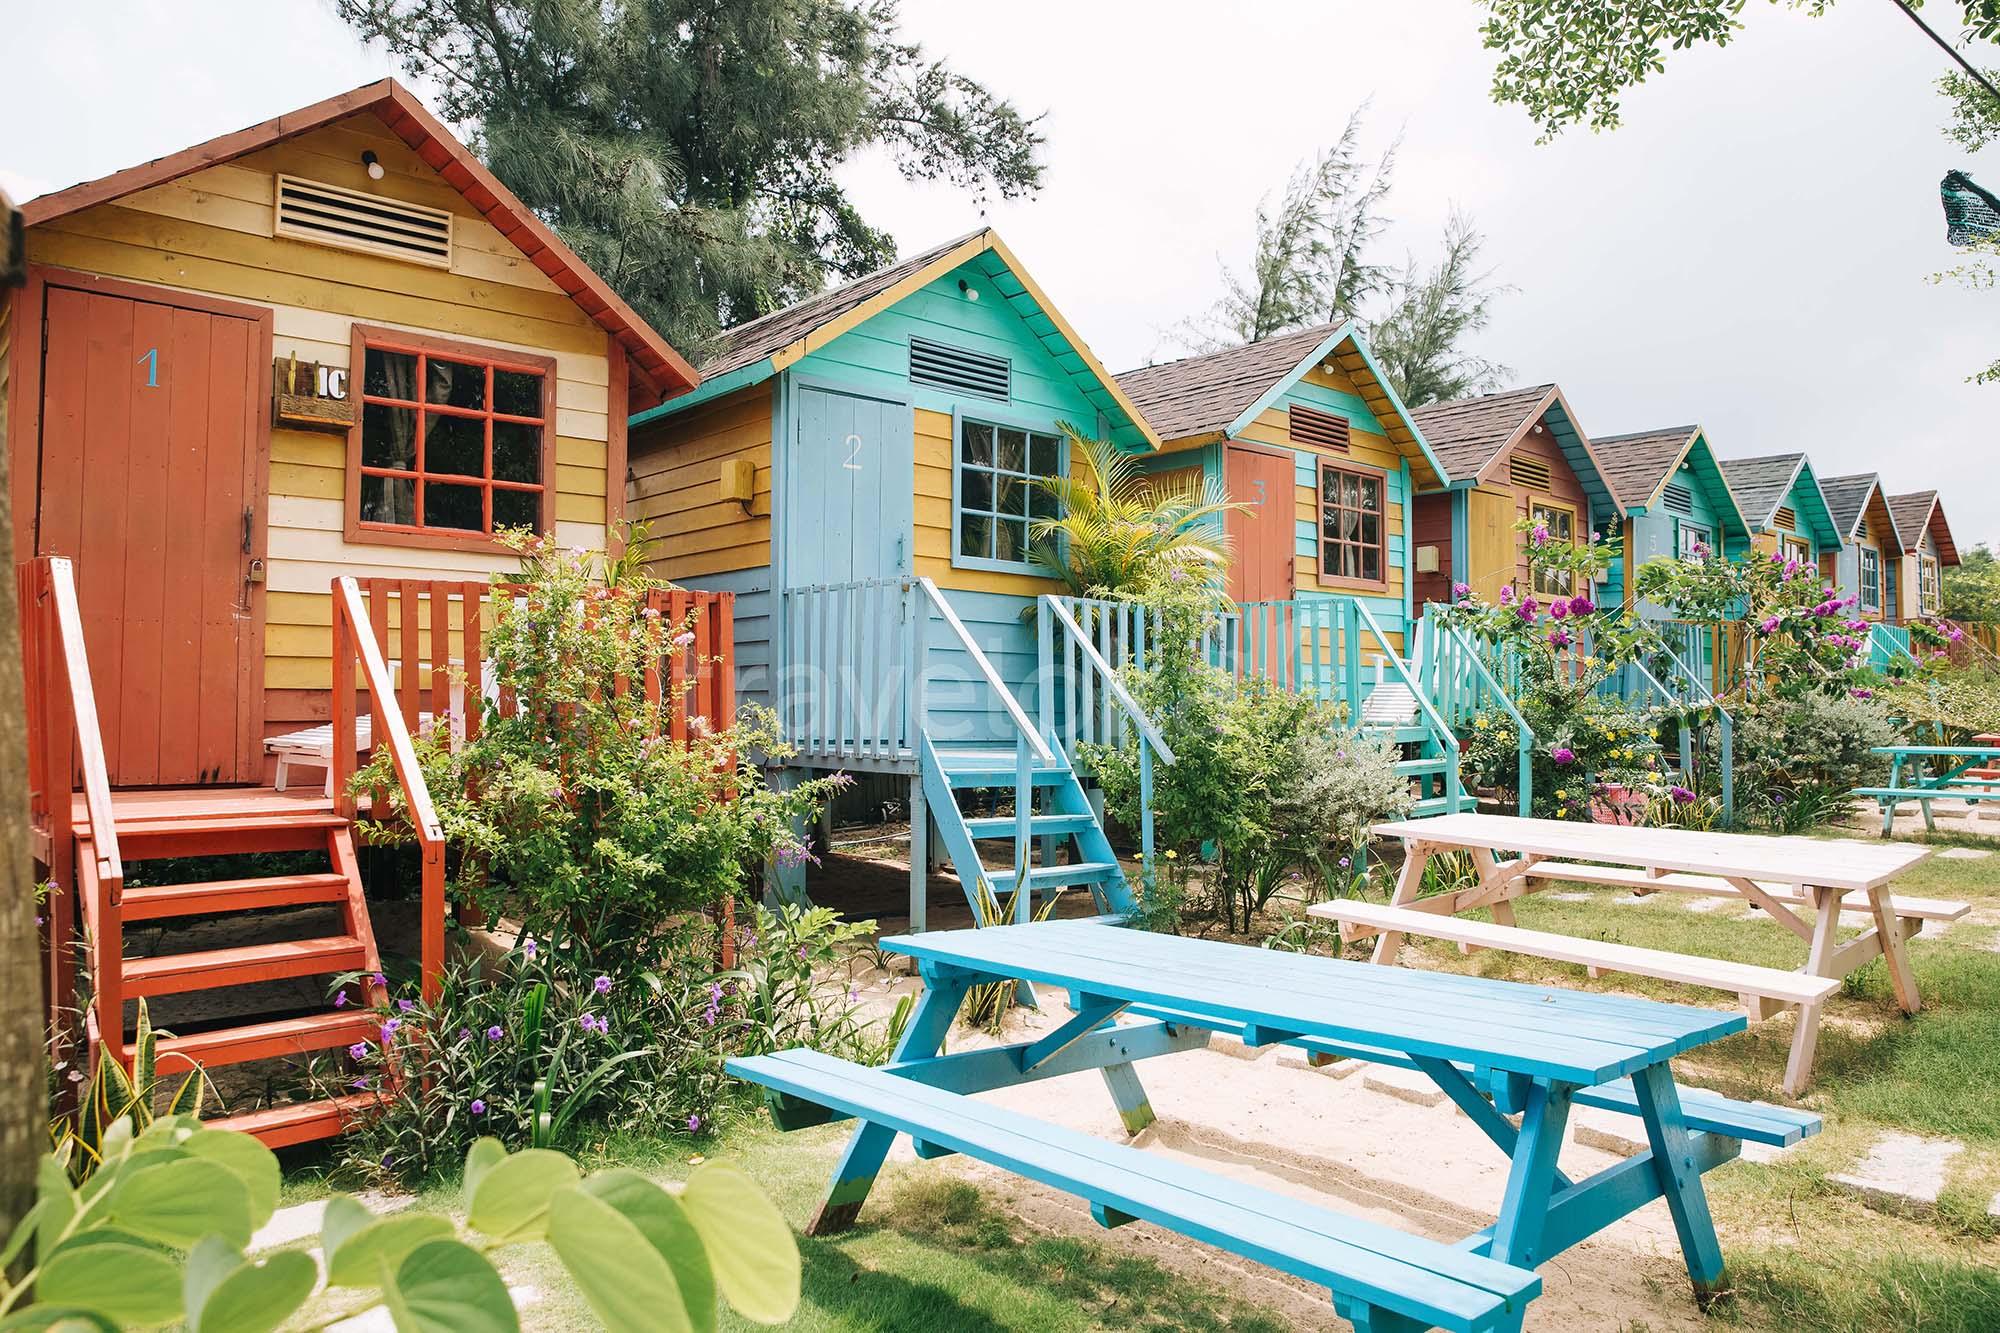 Cẩm nang du lịch Phan Thiết - Cocobeach Camp